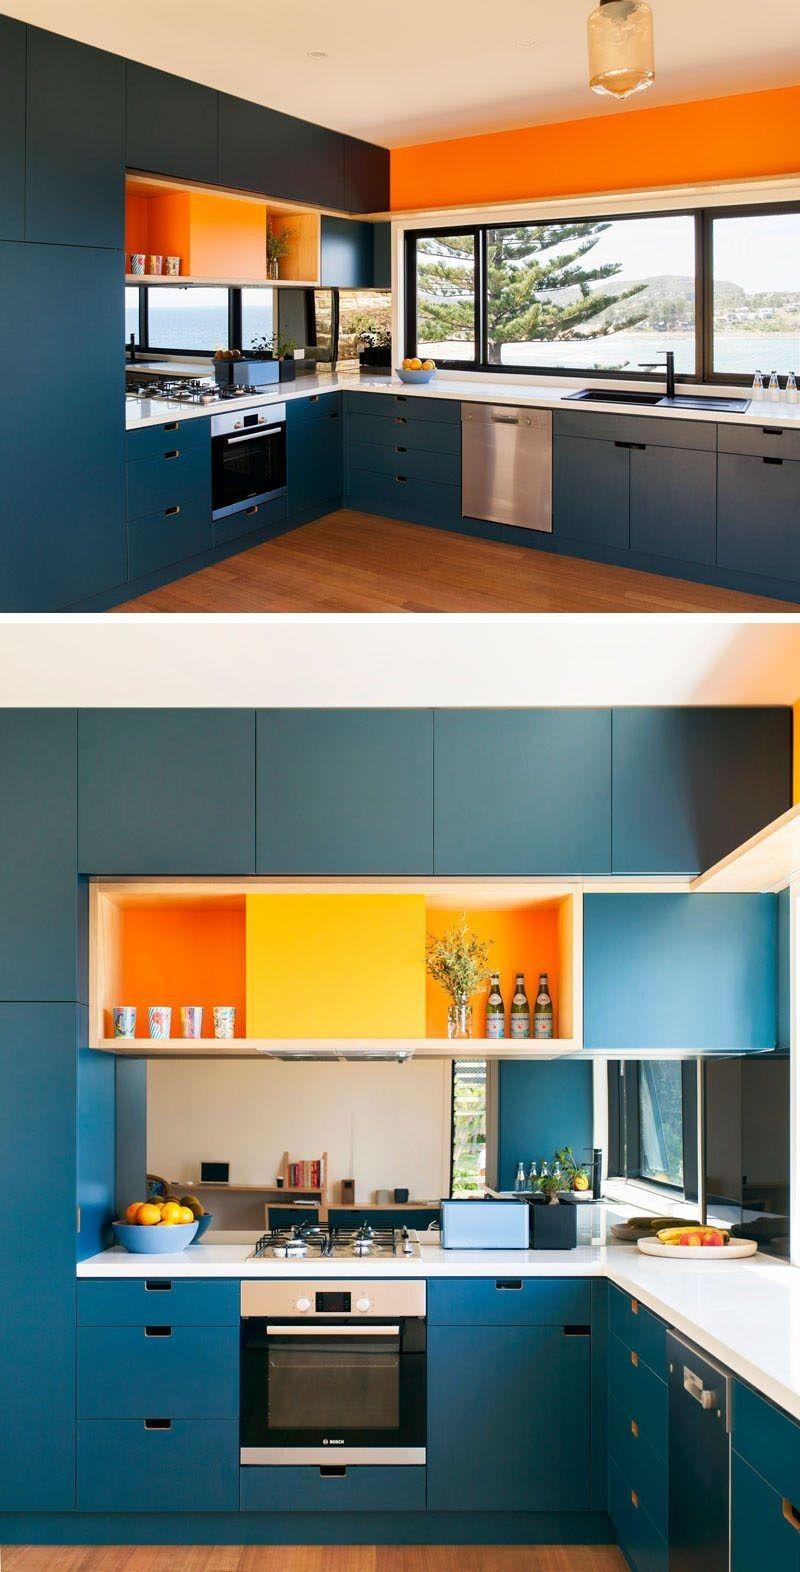 Modern interior House Design Trend for 2020 in 2020 (mit